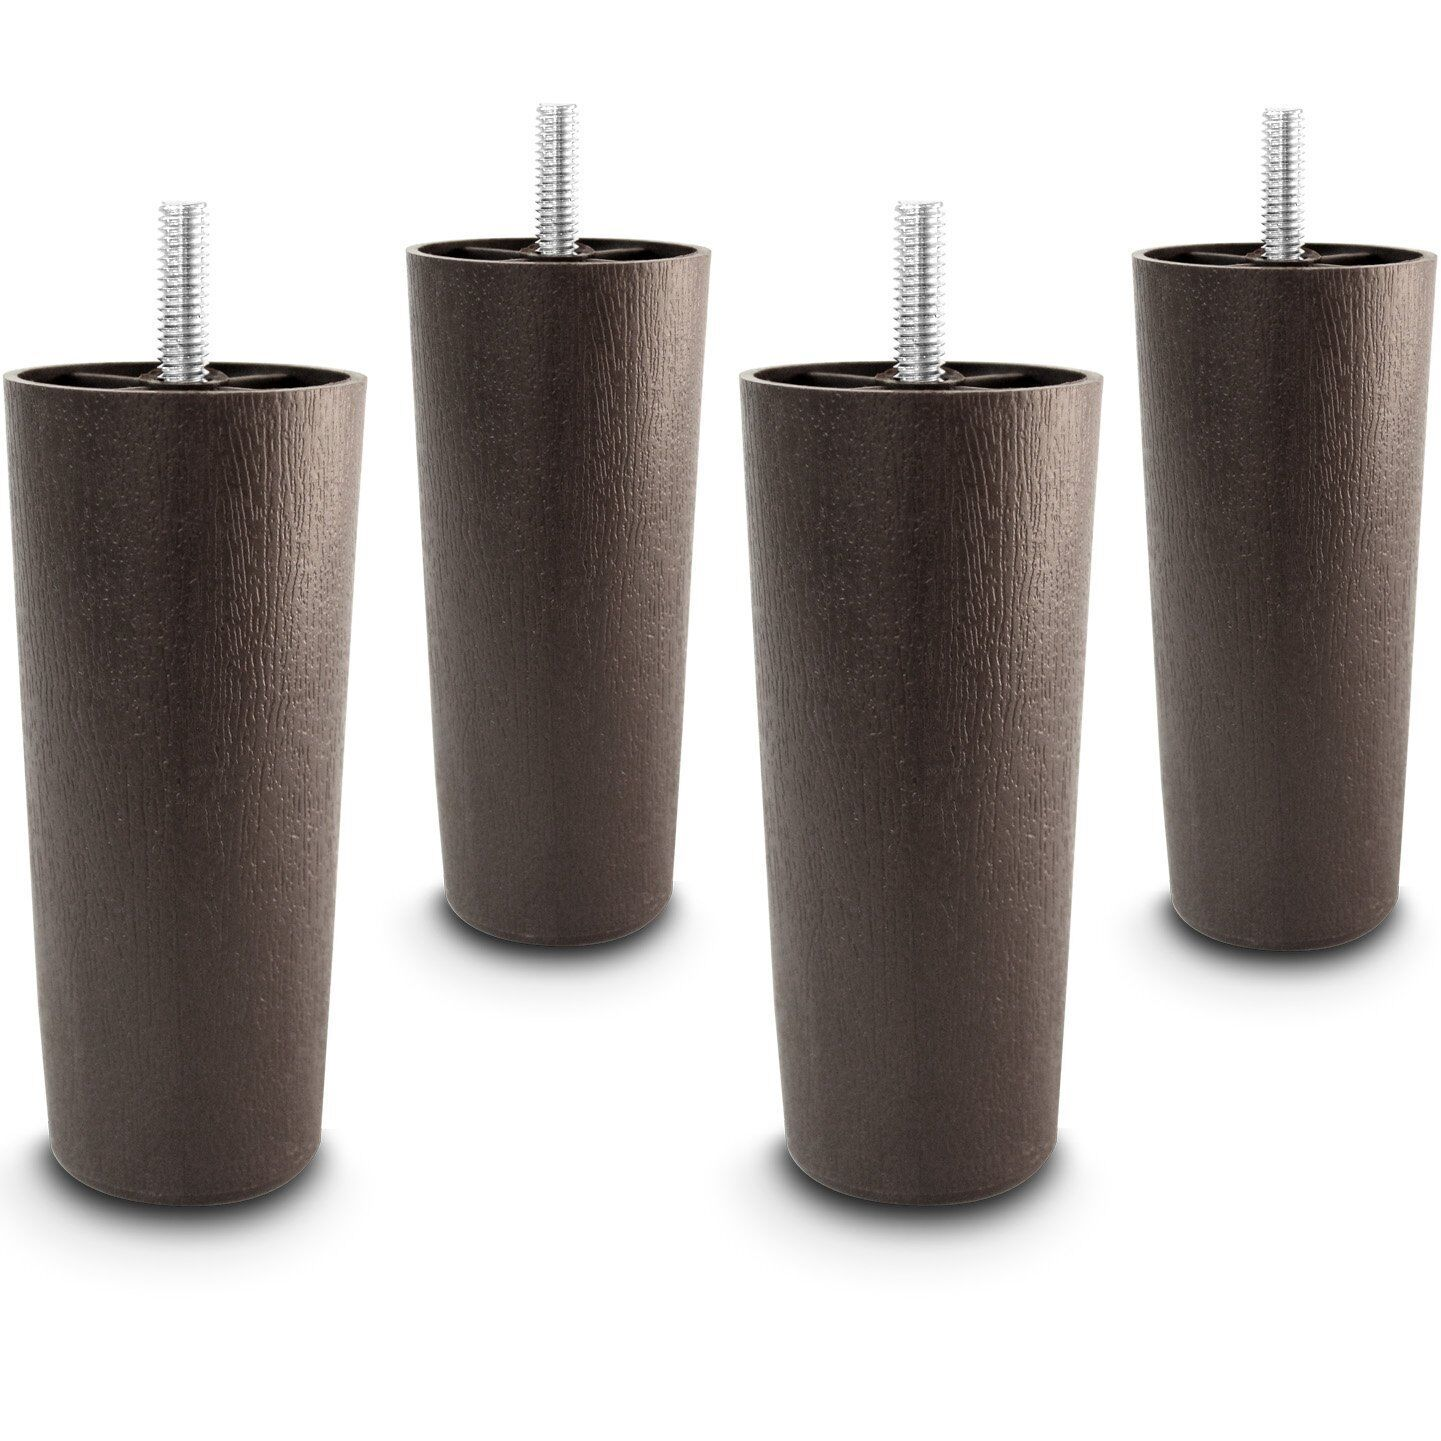 5″ Wood Bed Rail Furniture Round Edge Hook Zinc Metal Fasteners – 4 Bracket Sets Furniture